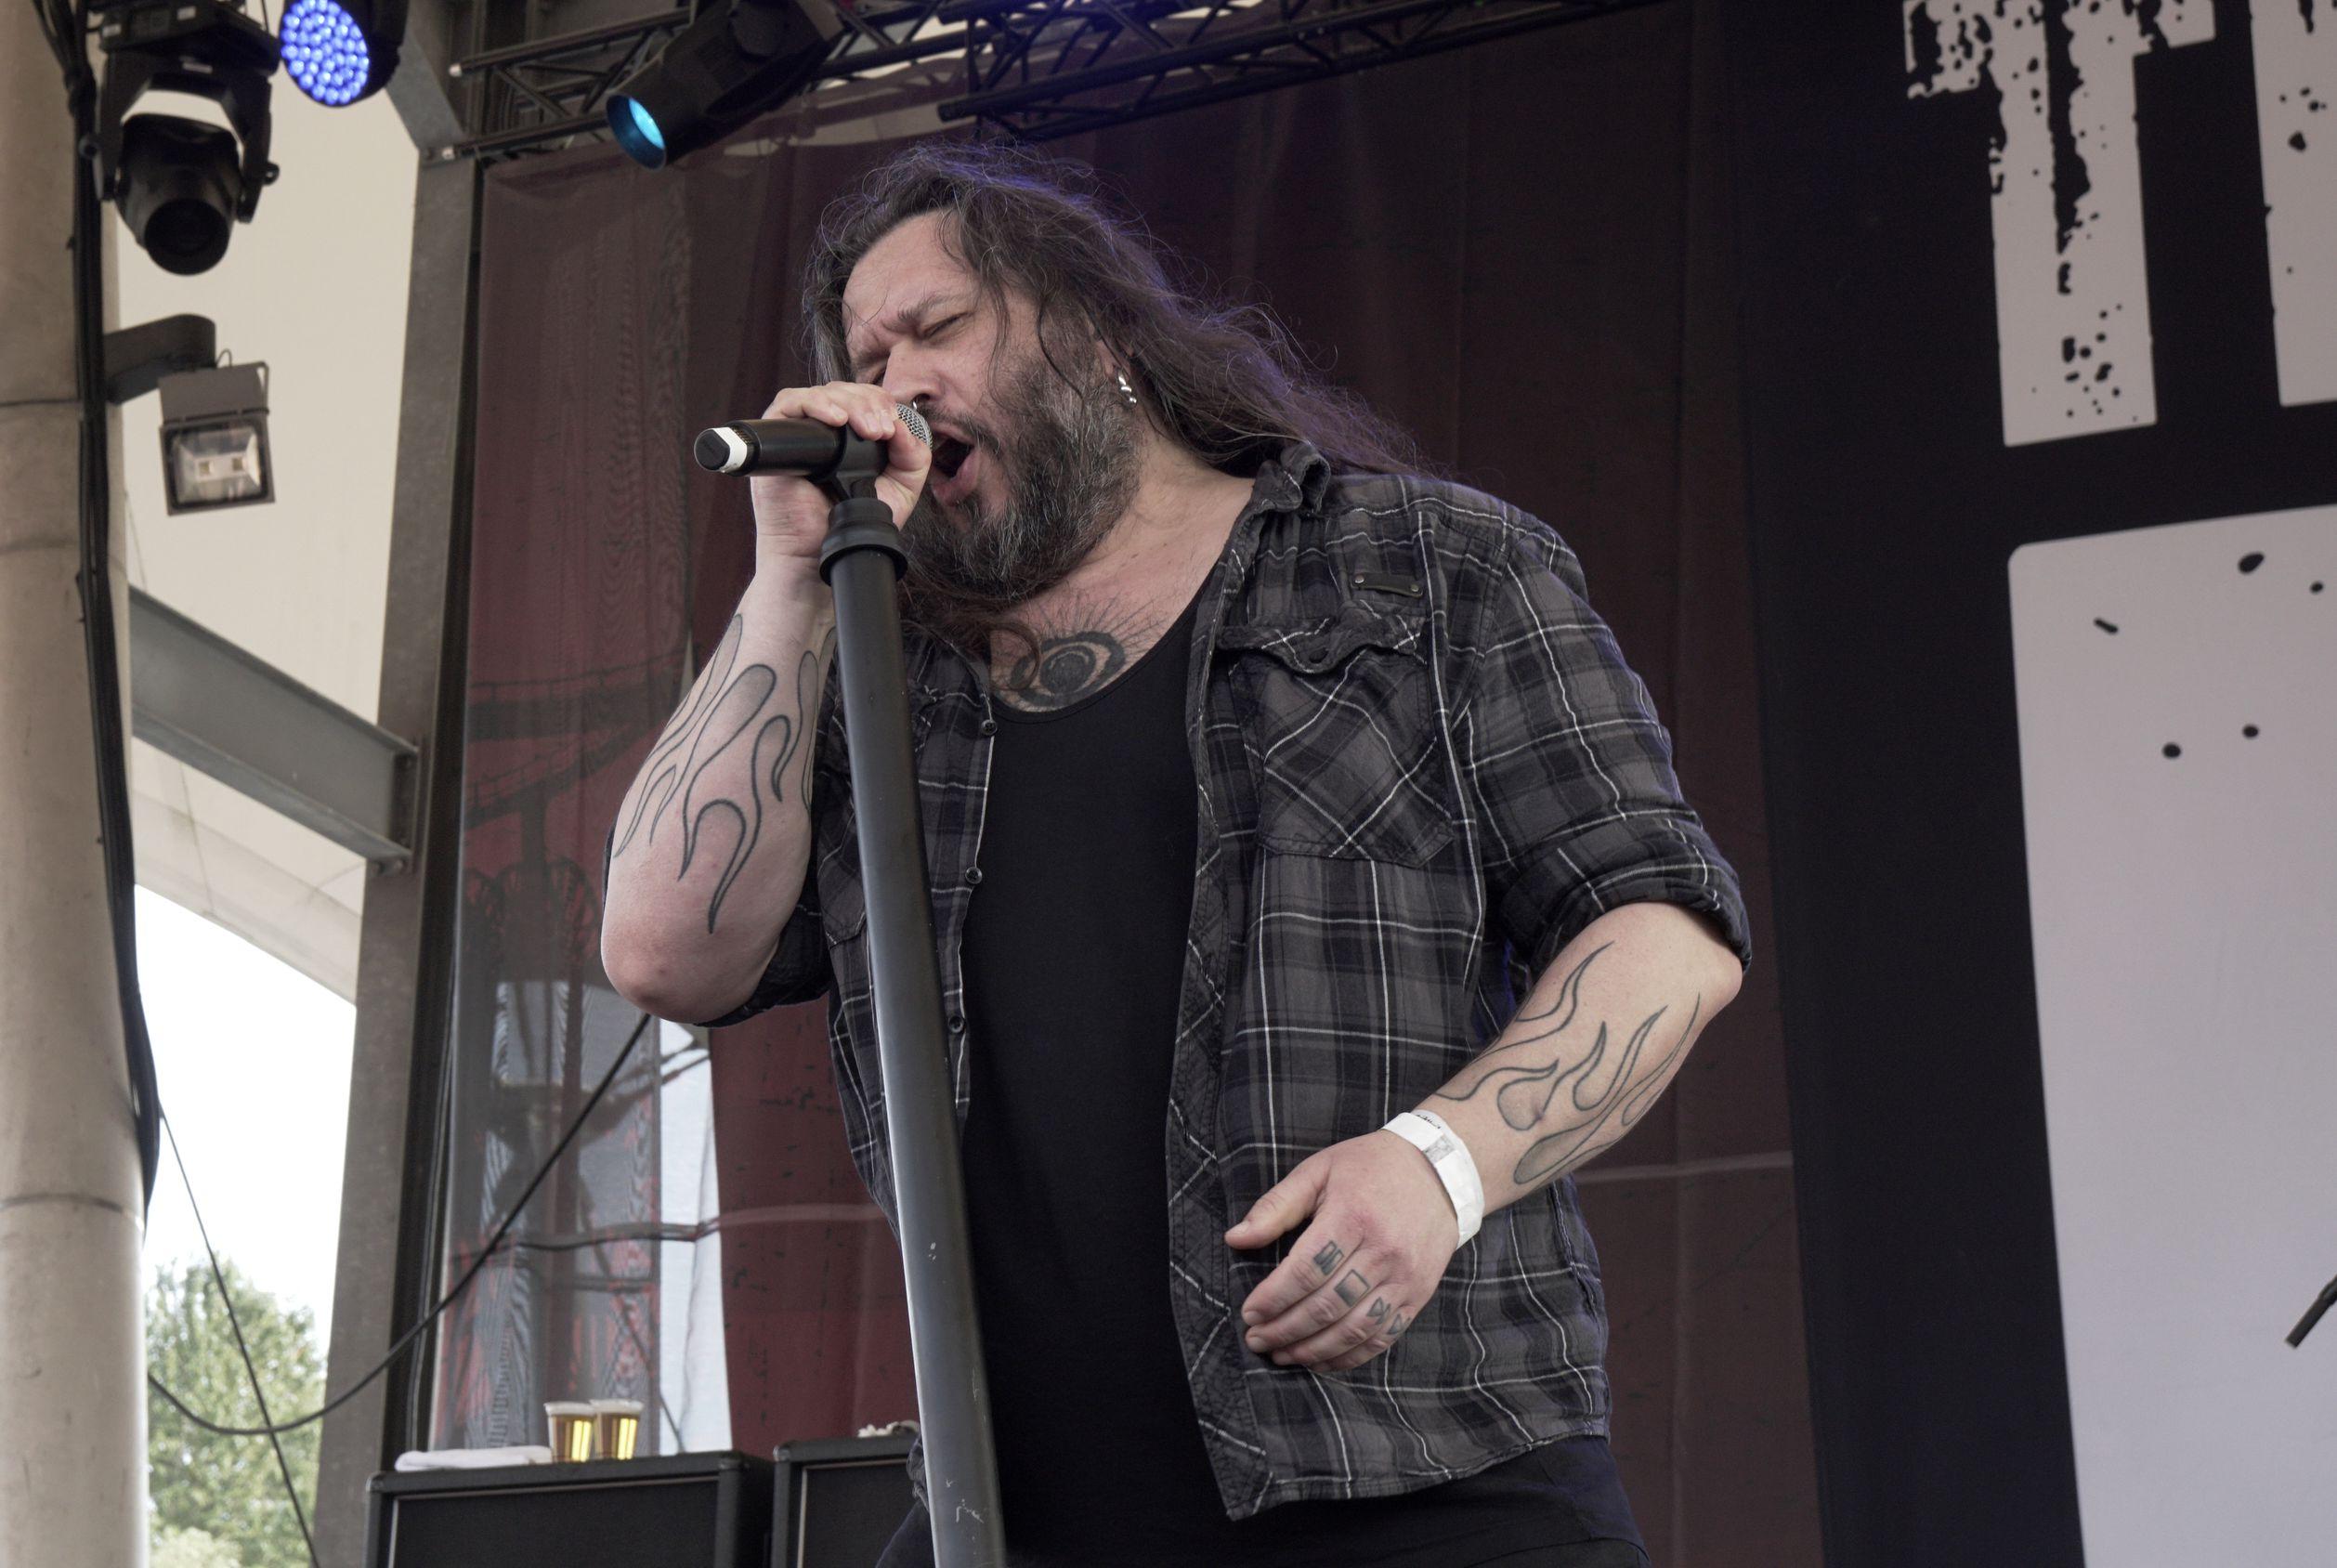 Rock-Hard-Festival-2021-One-Day-The-Very-End-Asphyx-Rage-Motorjesus-Wolfskull-Darkness-Scorched-Oak-Amphitheater-Gelsenkirchen_12